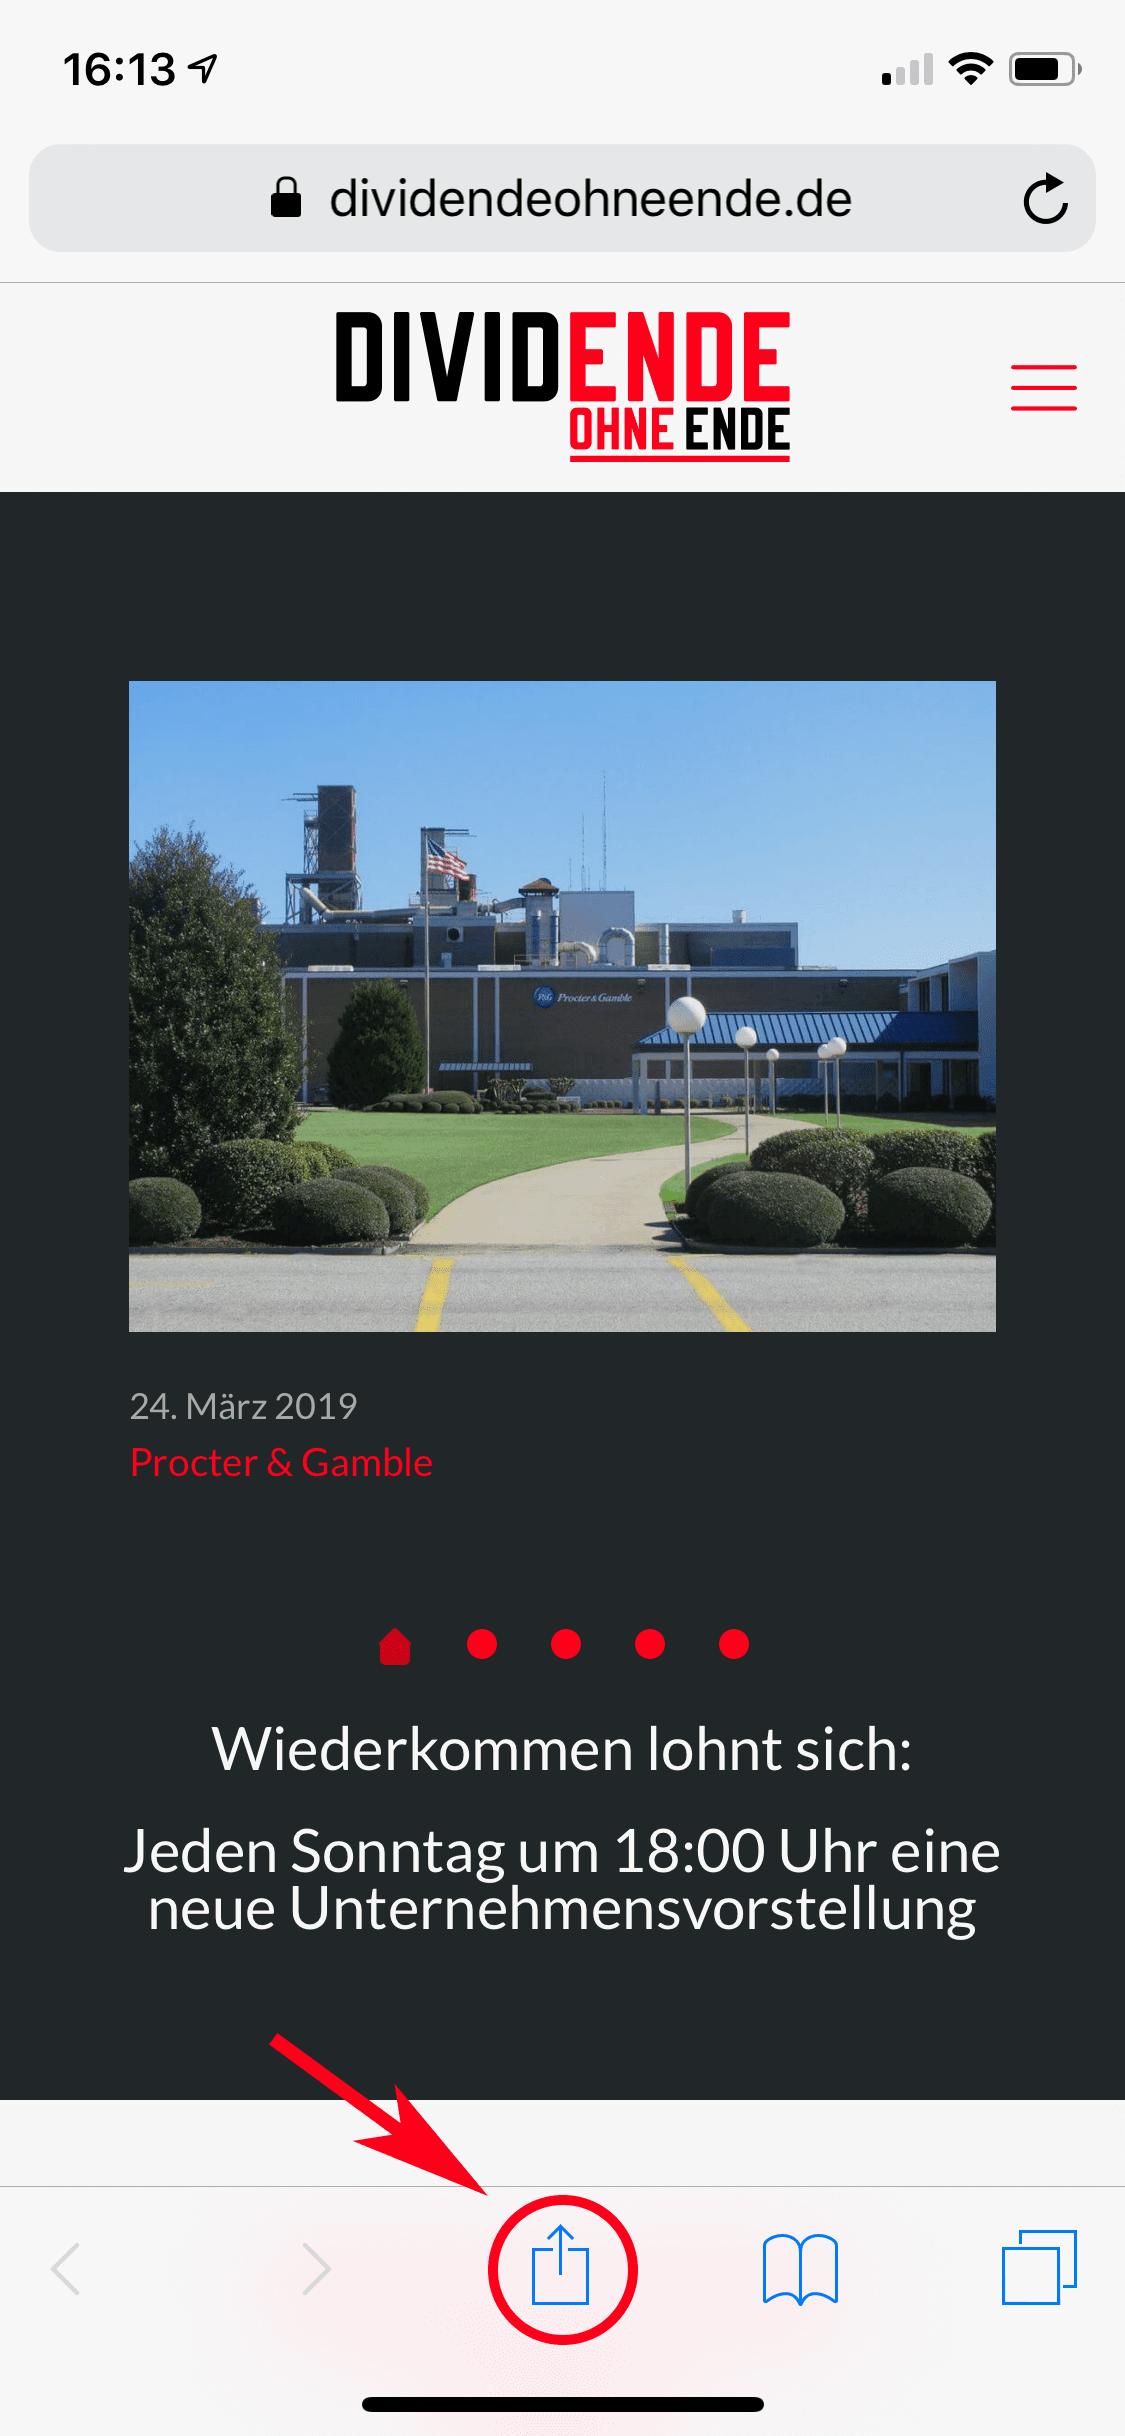 DividendeOhneEnde_App_iOS_1